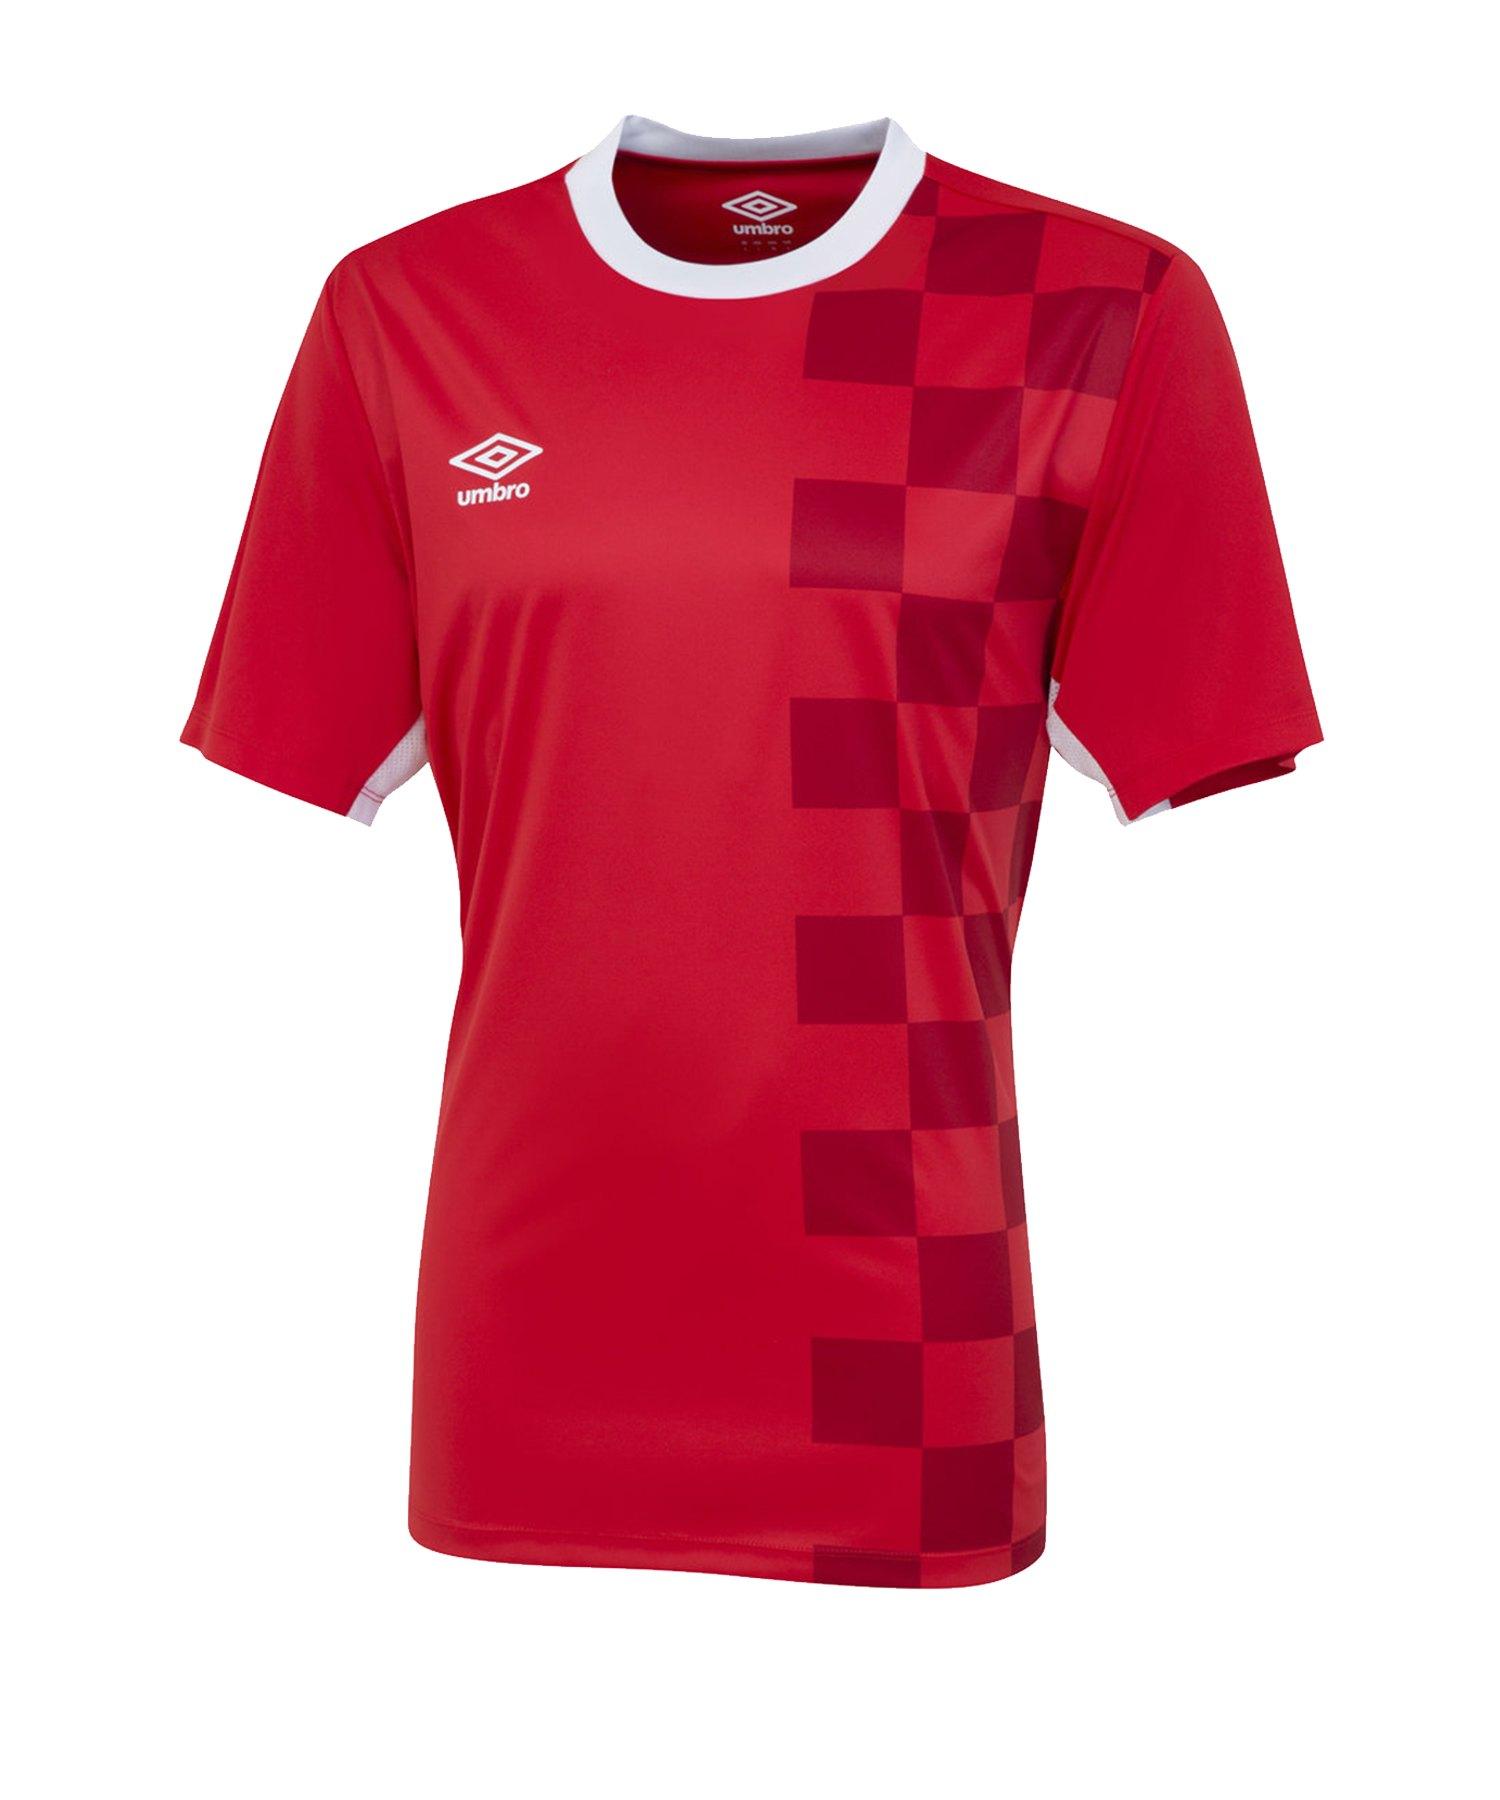 Umbro Stadion T-Shirt Rot FA54 - Rot